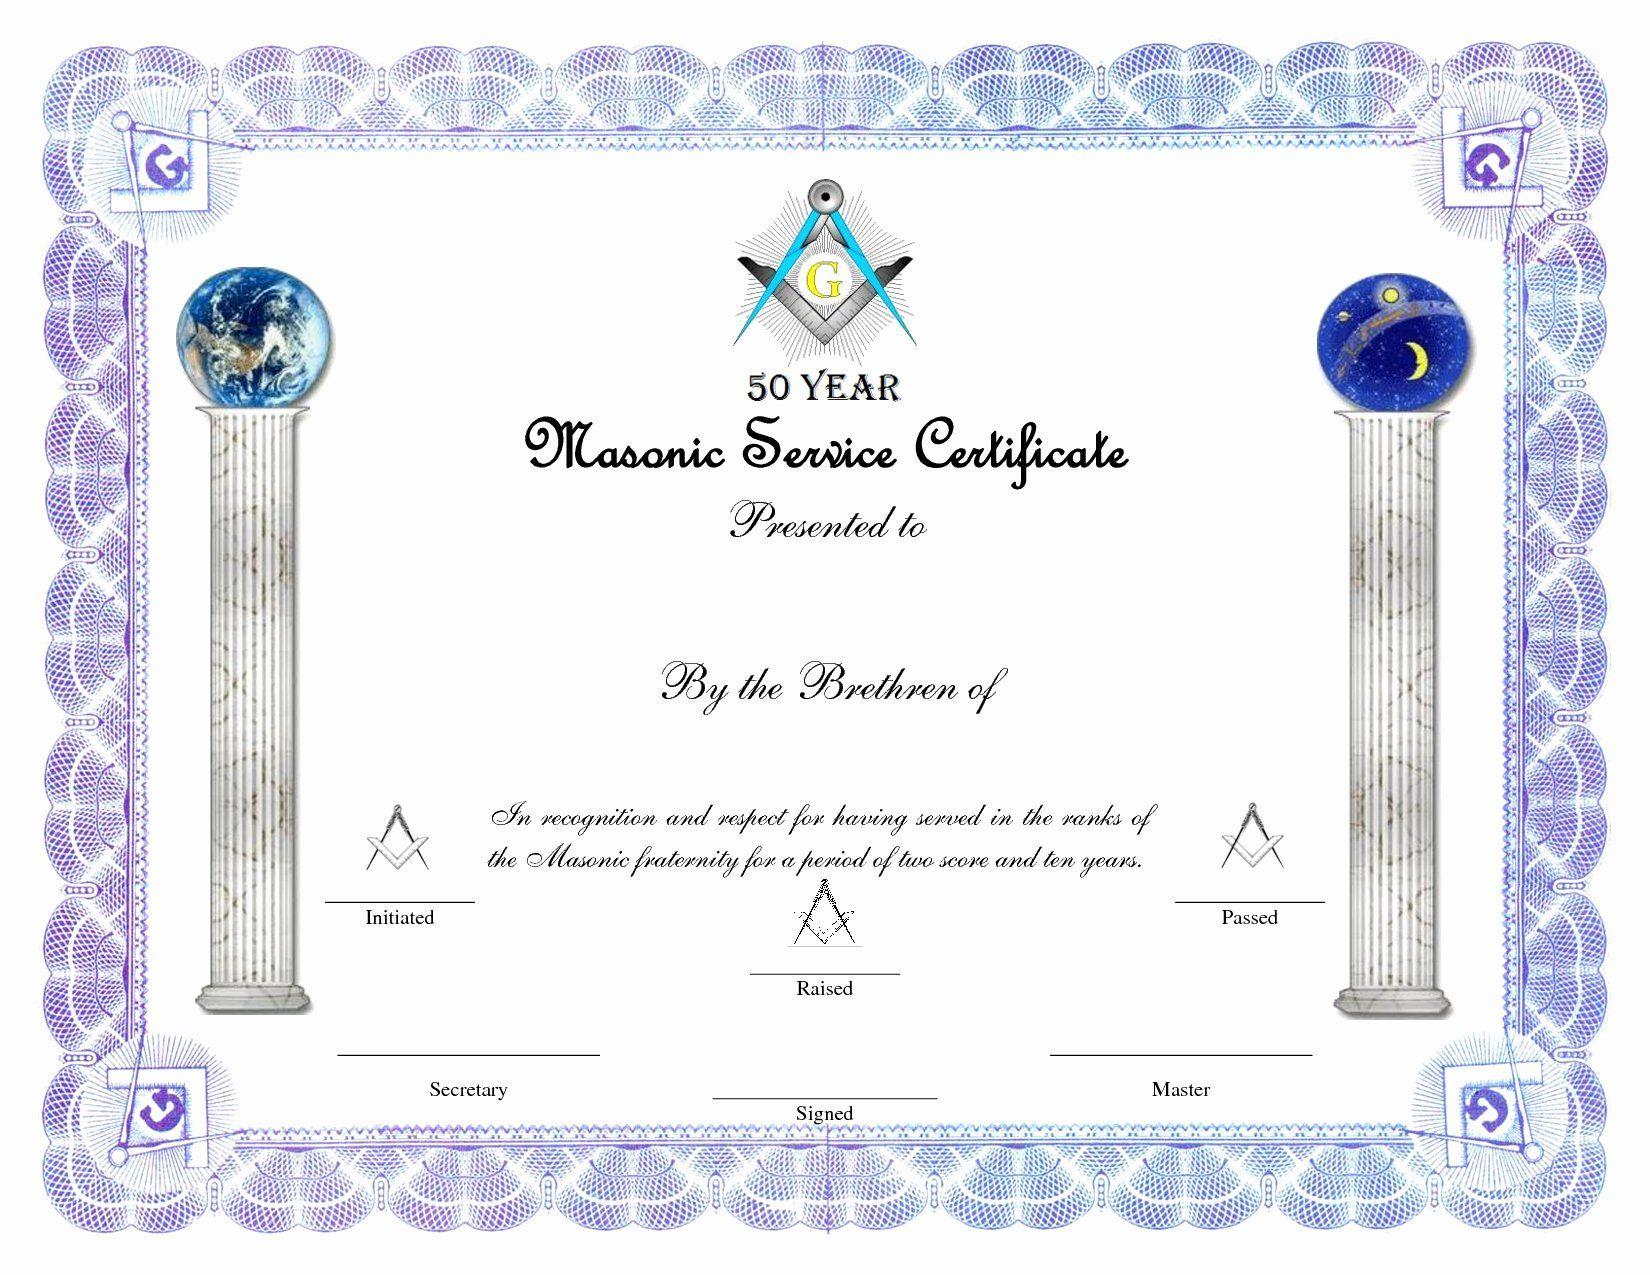 Masonic Certificate Of Appreciation Template Unique Certificates Of Certificate Of Appreciation Certificate Of Appreciation Template Certificate Templates Free